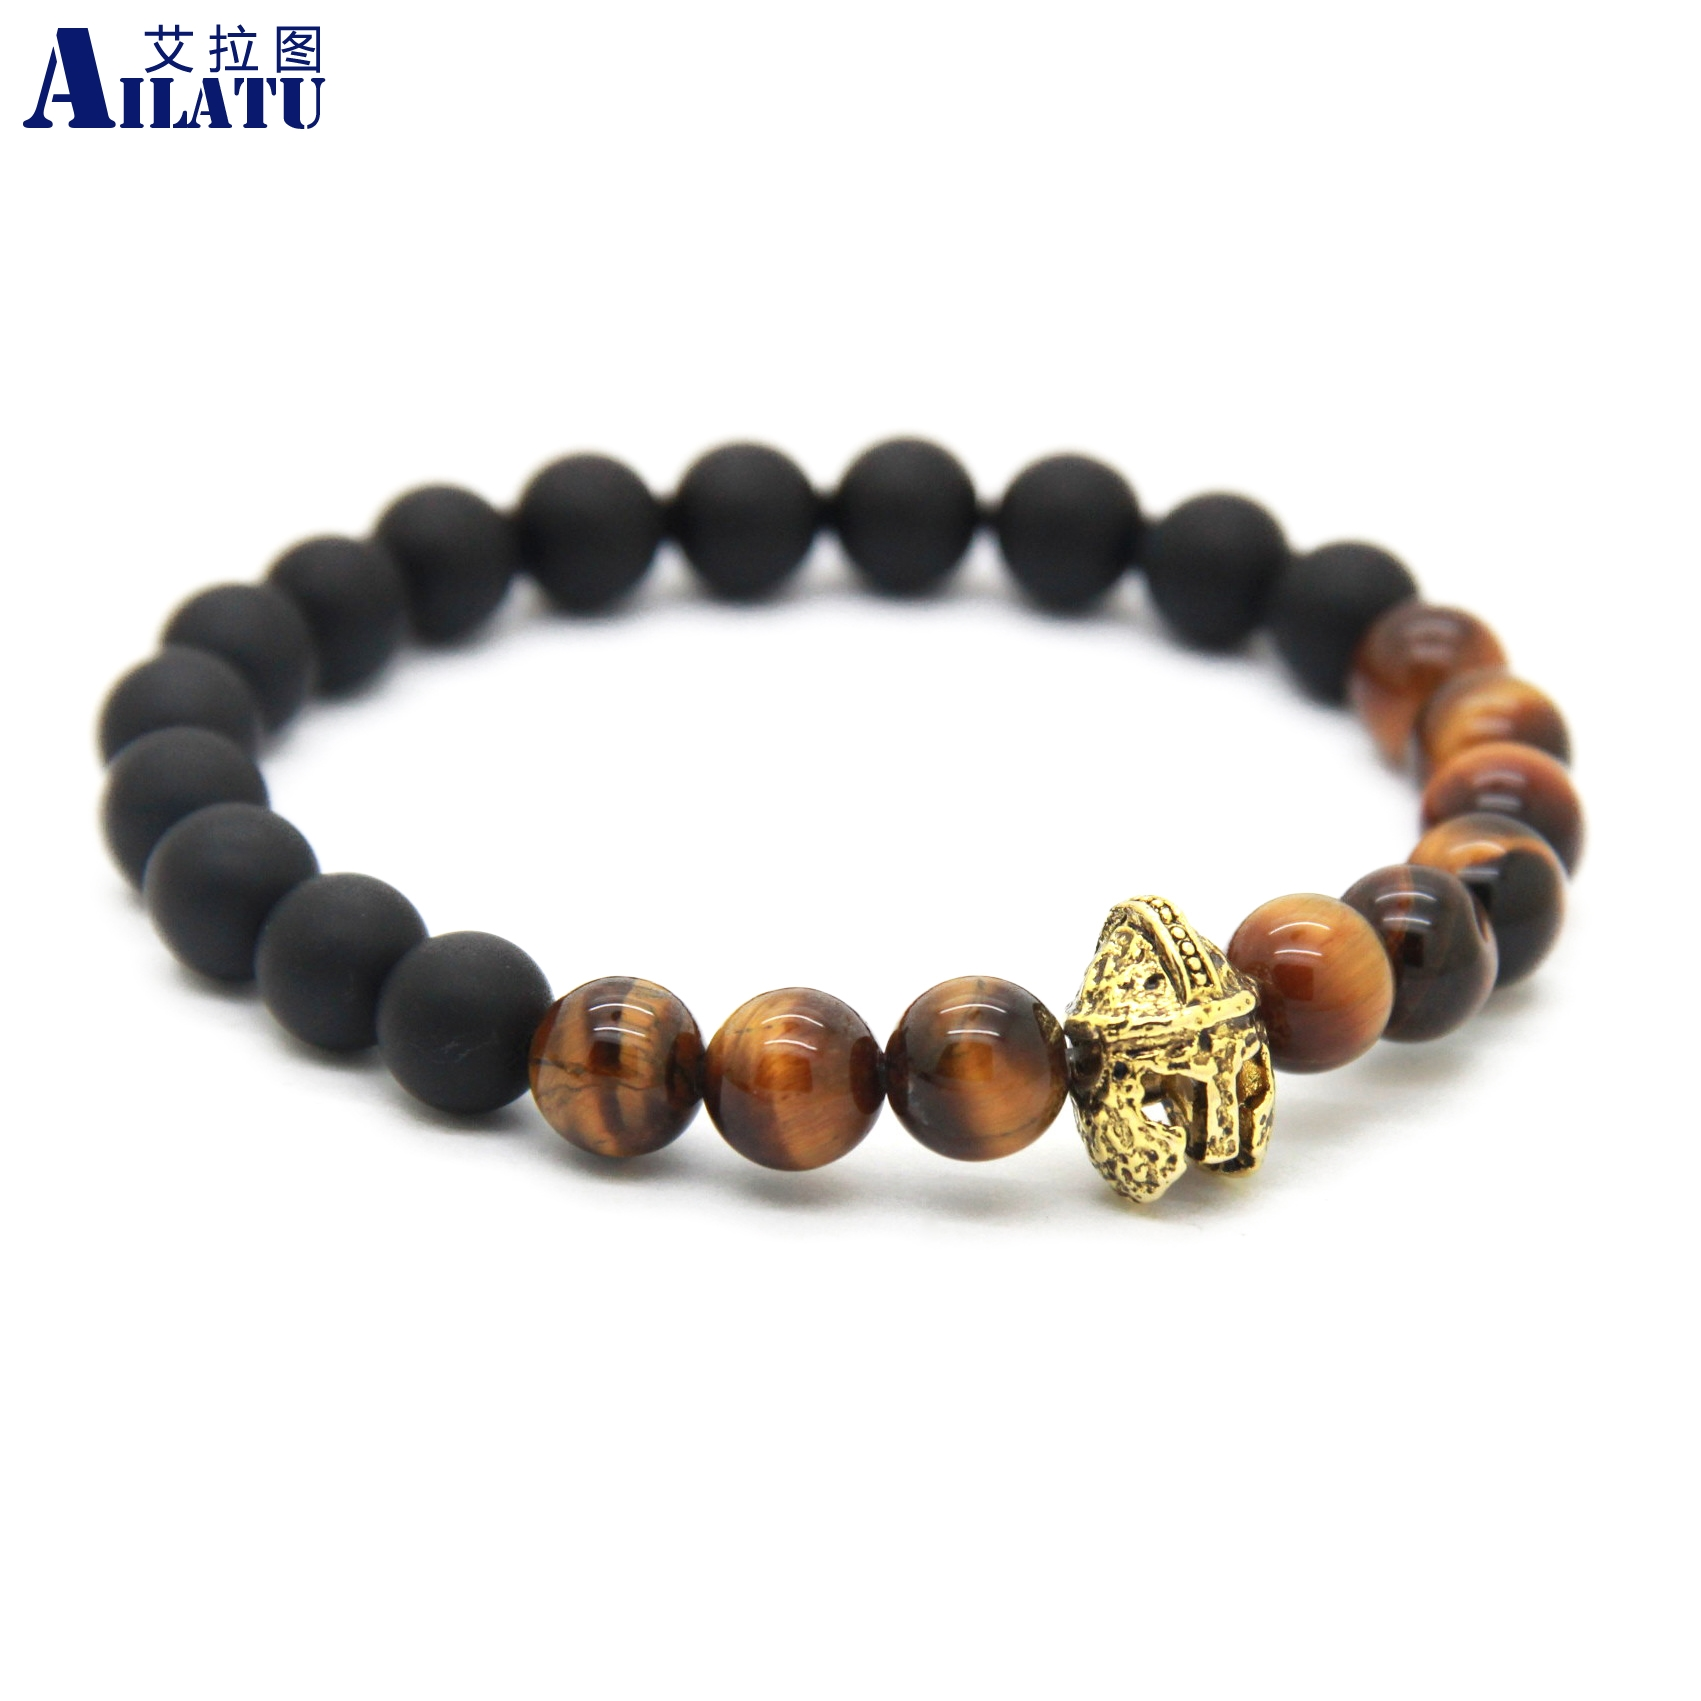 Ailatu Guardian of the City Mens Jewelry 8mm Pulseras Hombre Natural Tiger Eye Stone Beads Roman Helmet Bracelet